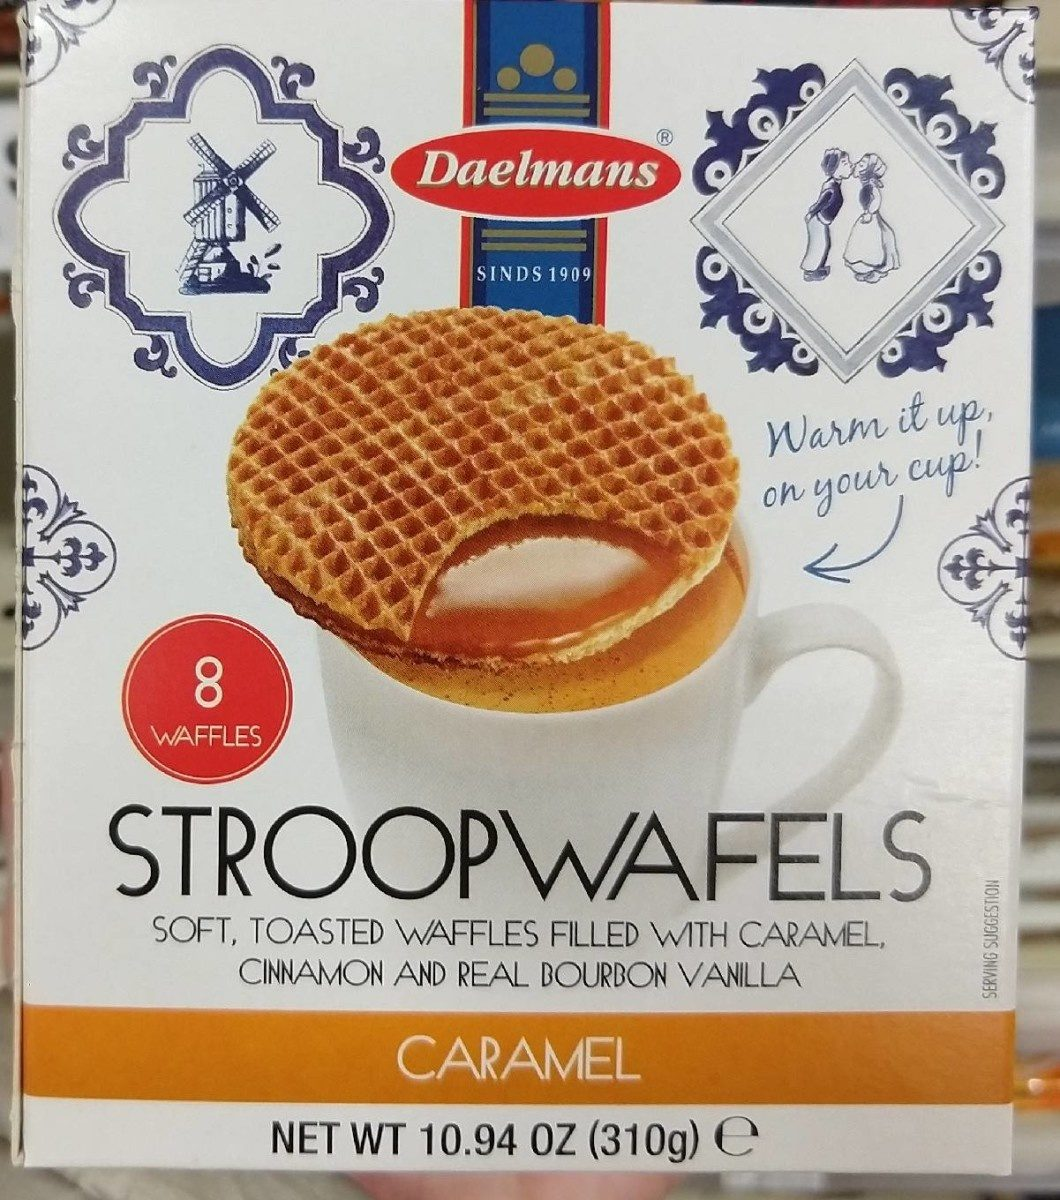 Daelmans, stroop wafels, caramel - Product - en